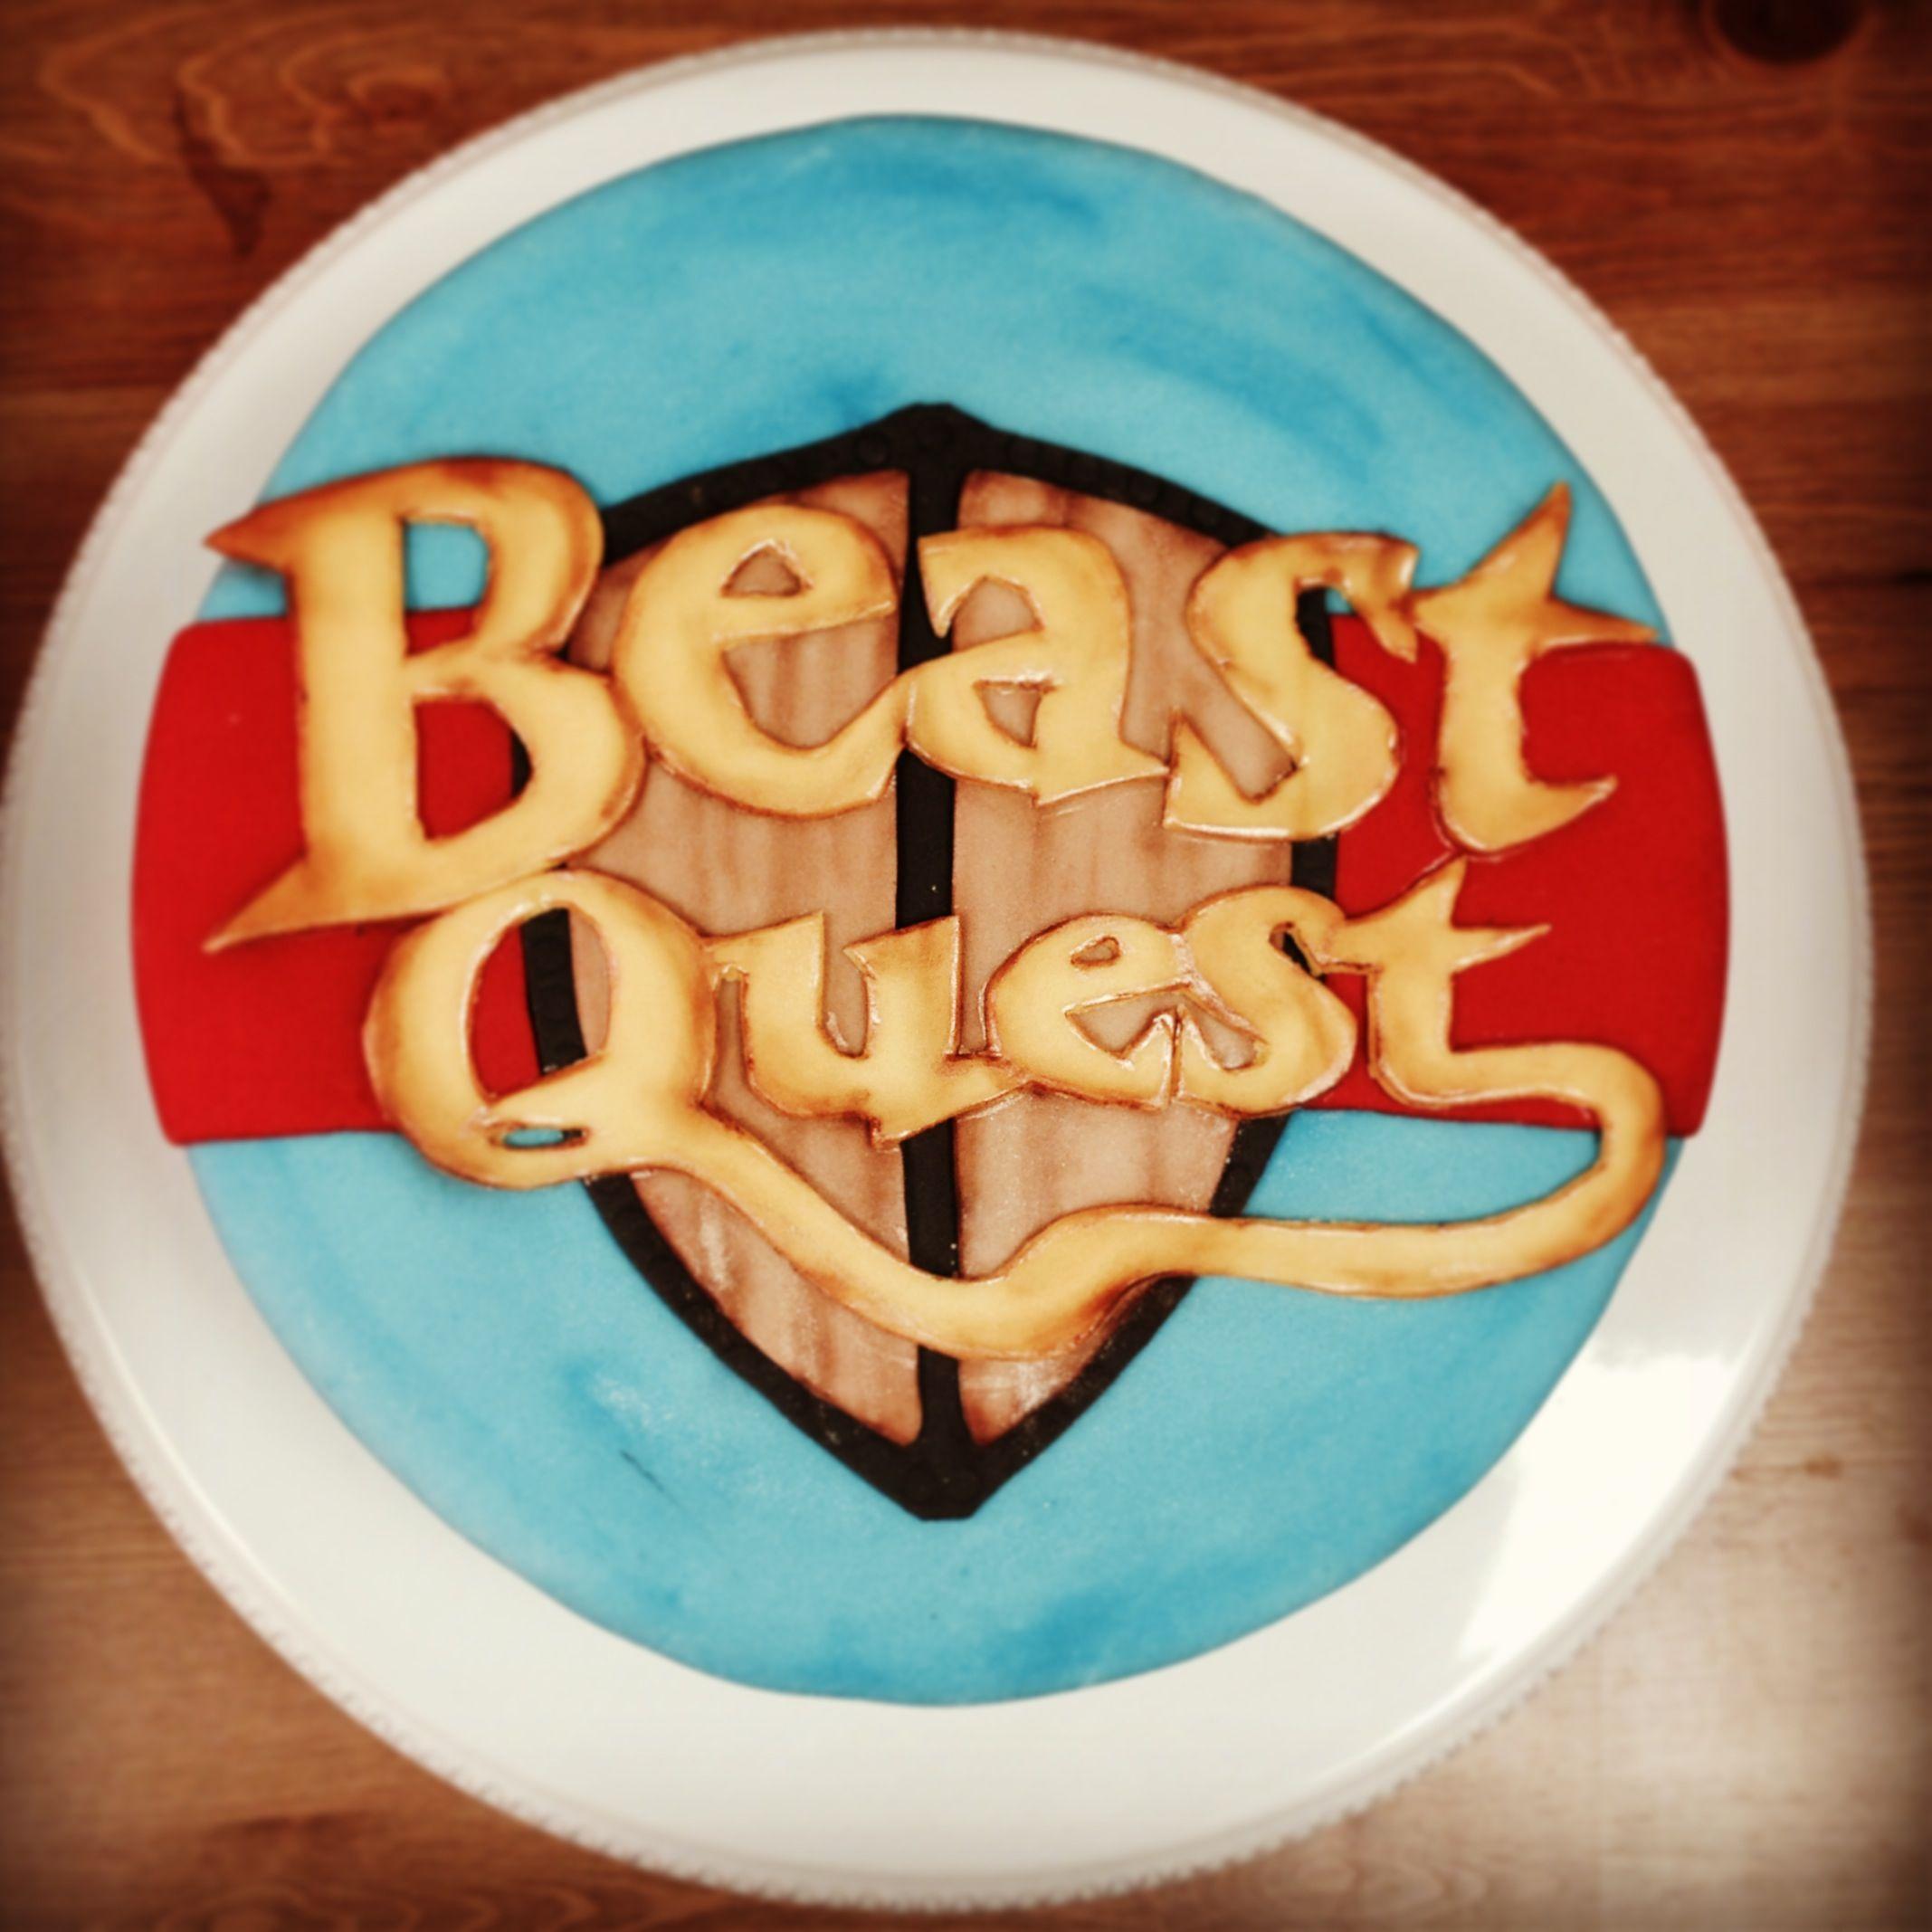 Beast quest birthday cake kids birthday party